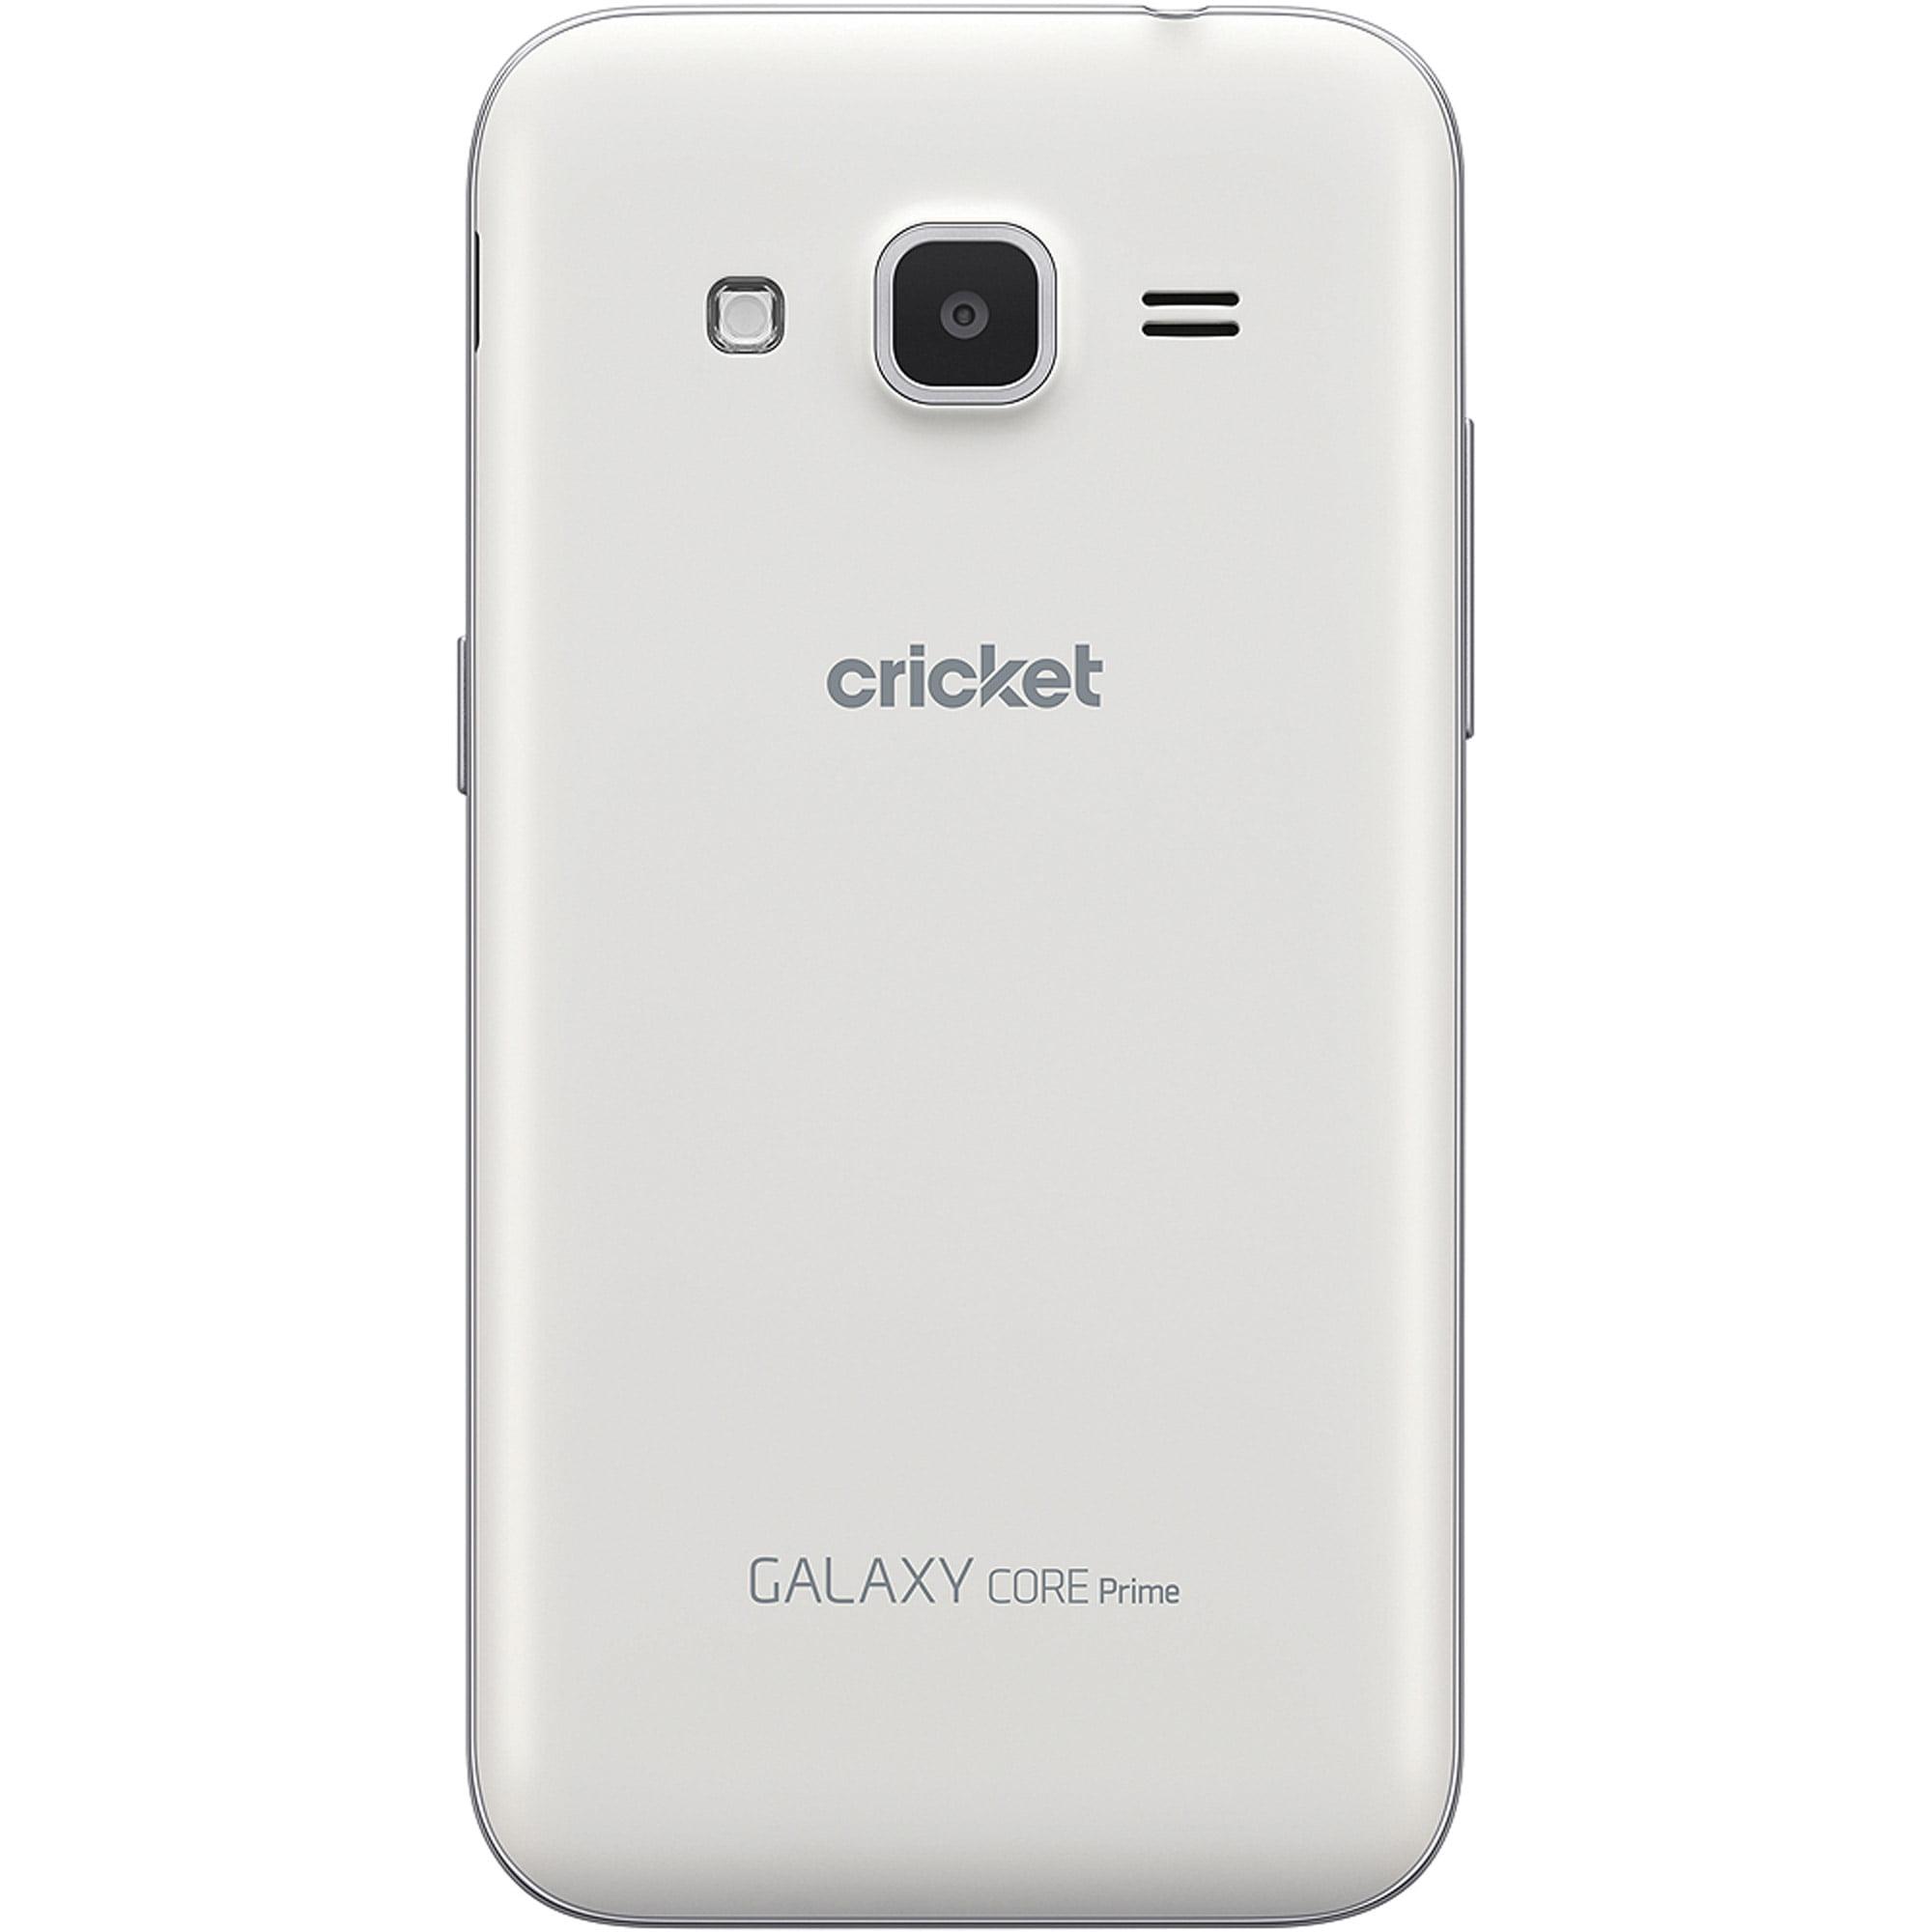 Cricket wireless customer service - Cricket Wireless Samsung Galaxy Core Prime Prepaid Smartphone Walmart Com